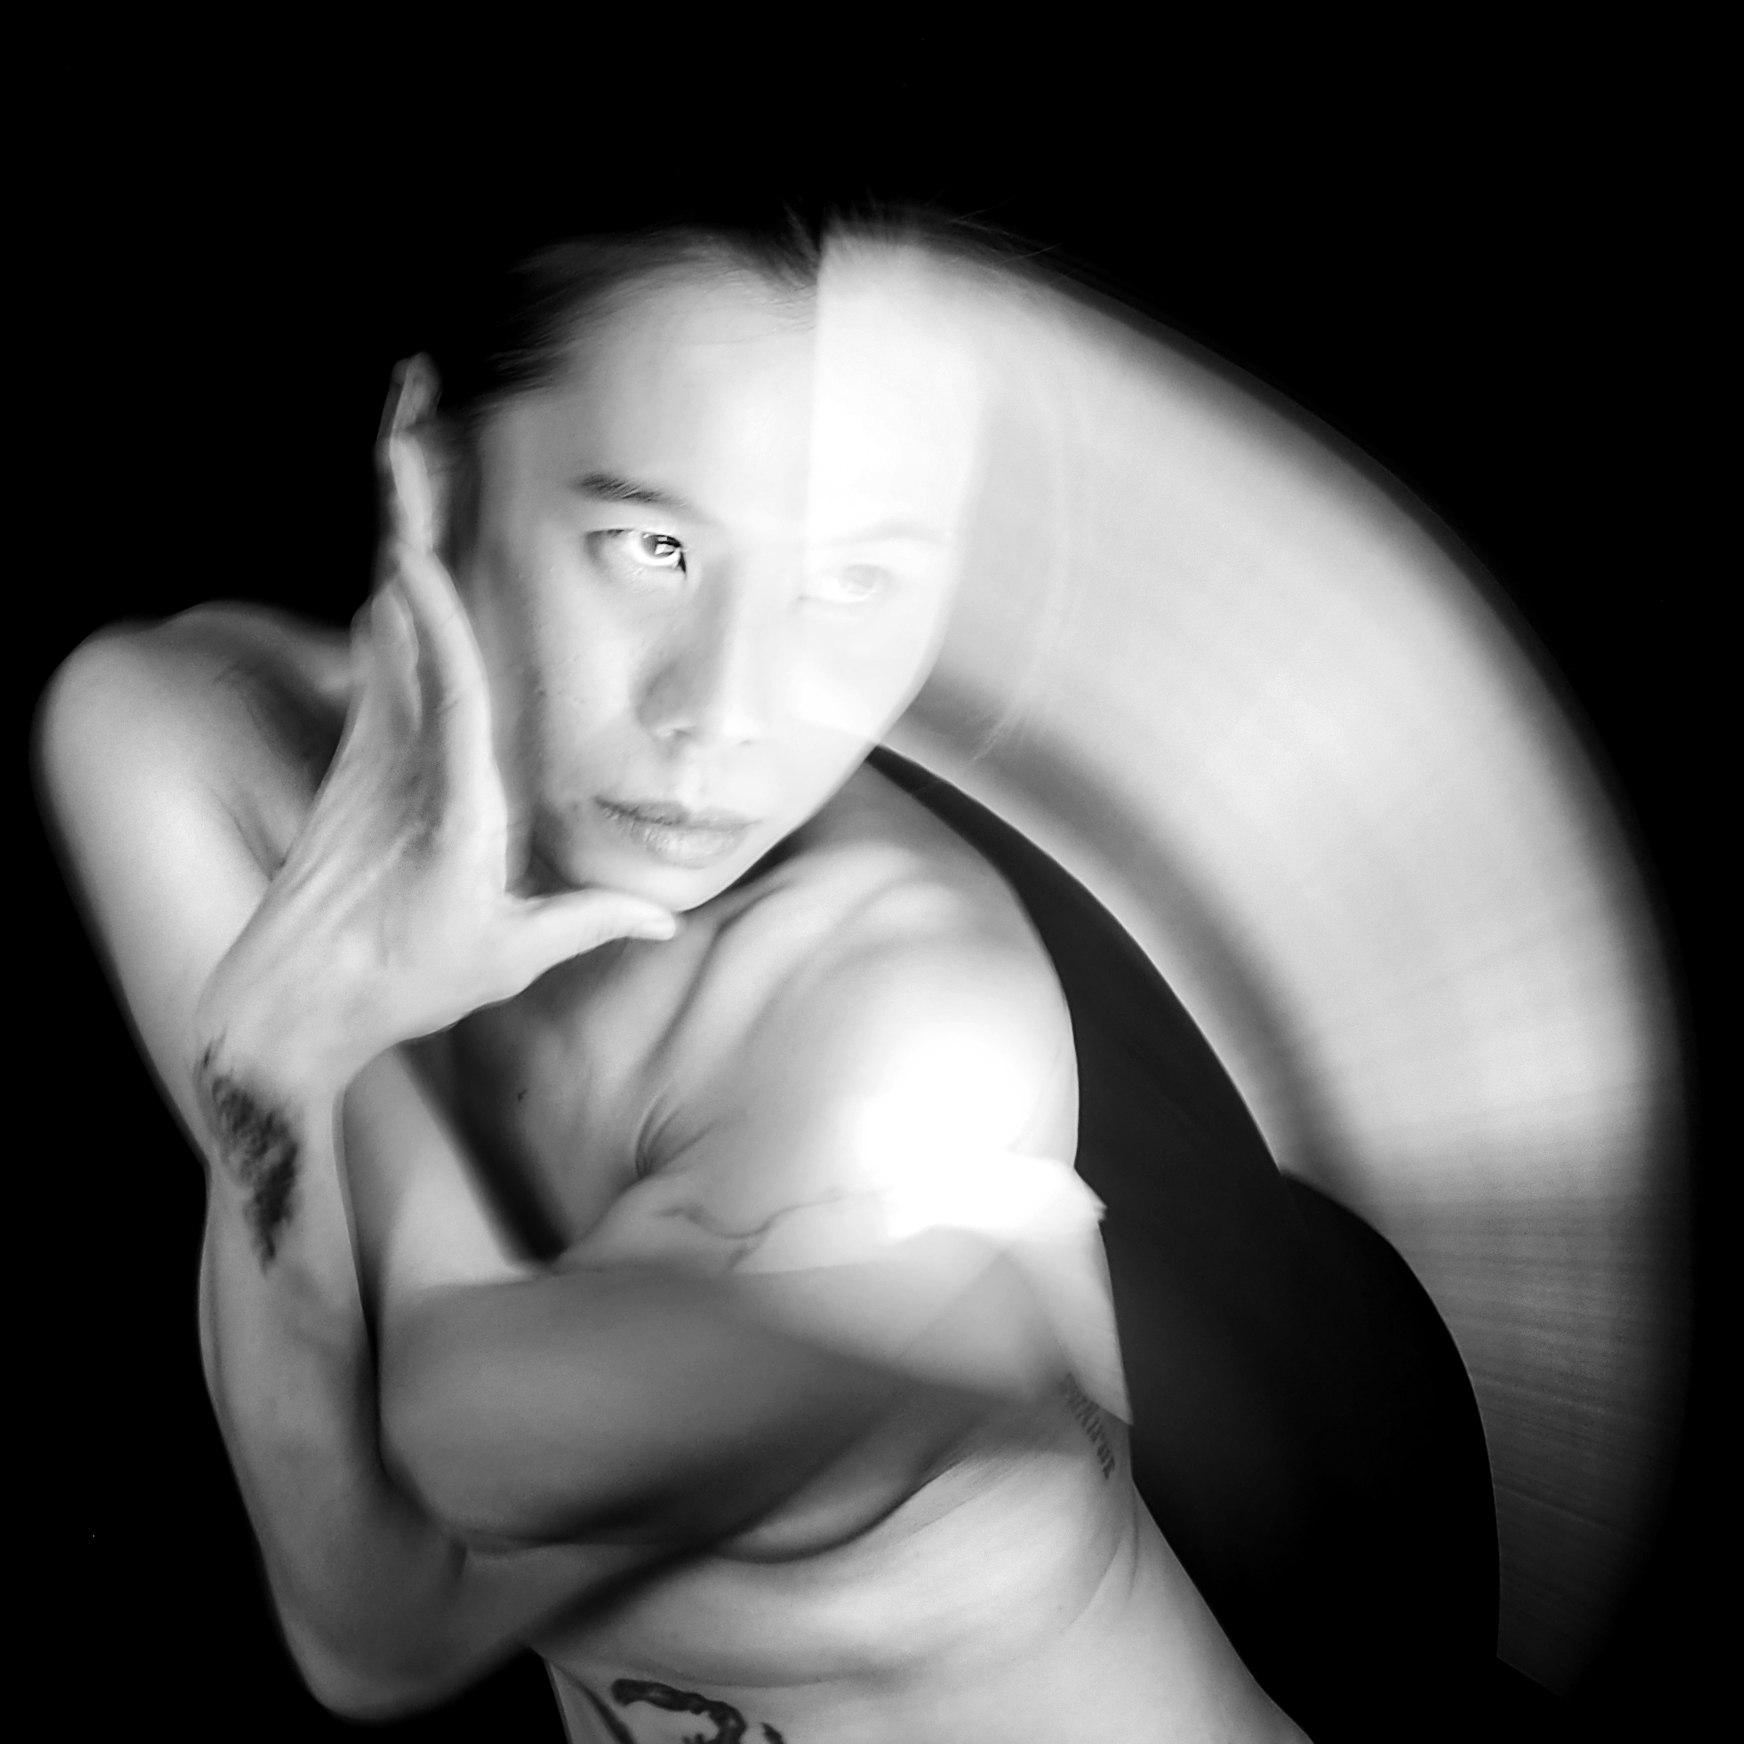 2021 / Photo by Suelynee ho, Taiwan artist Photographer